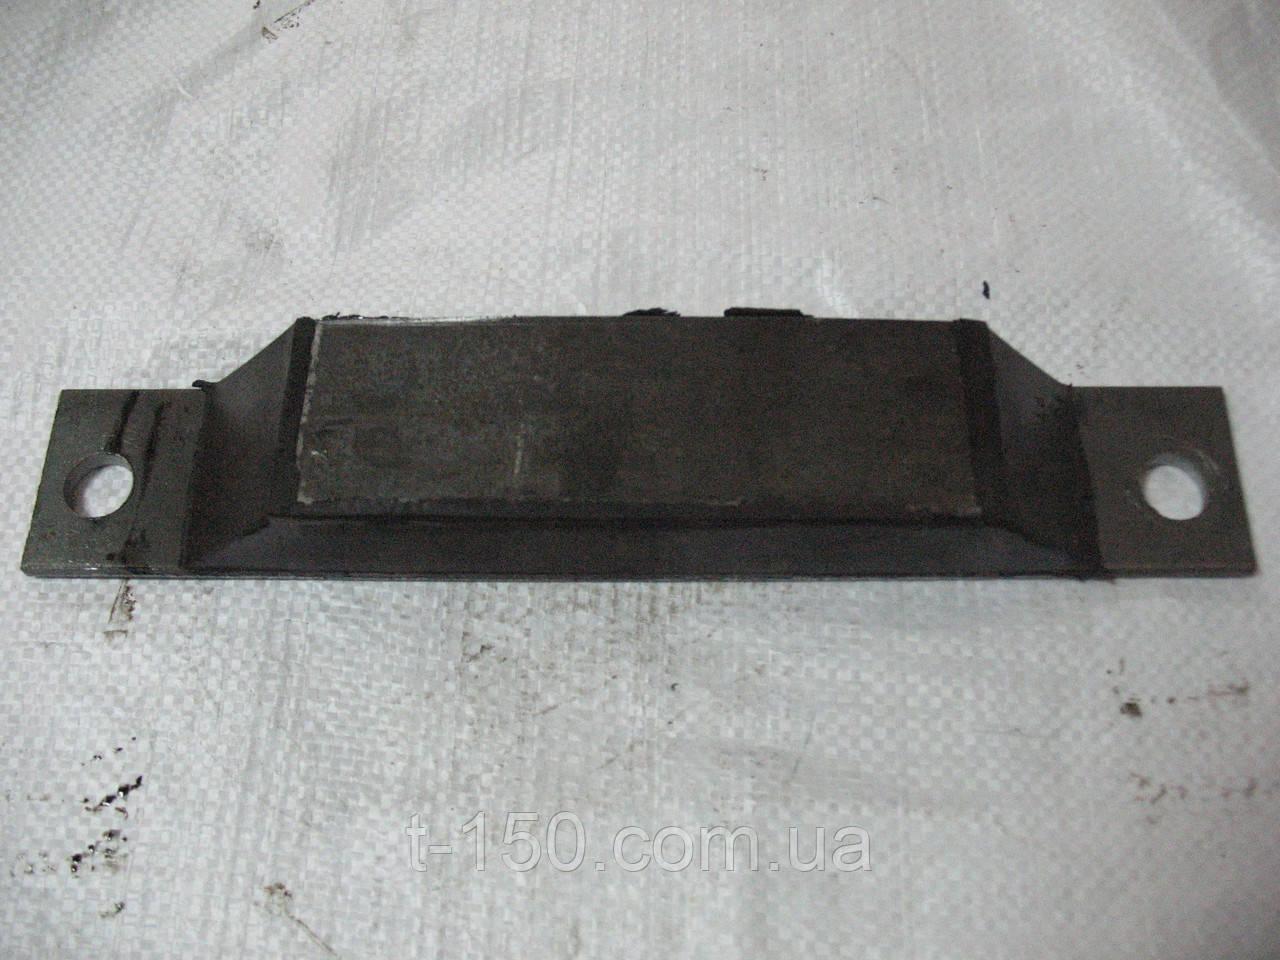 Подушка двигателя, КПП Т-150 (150.00.073) пластина